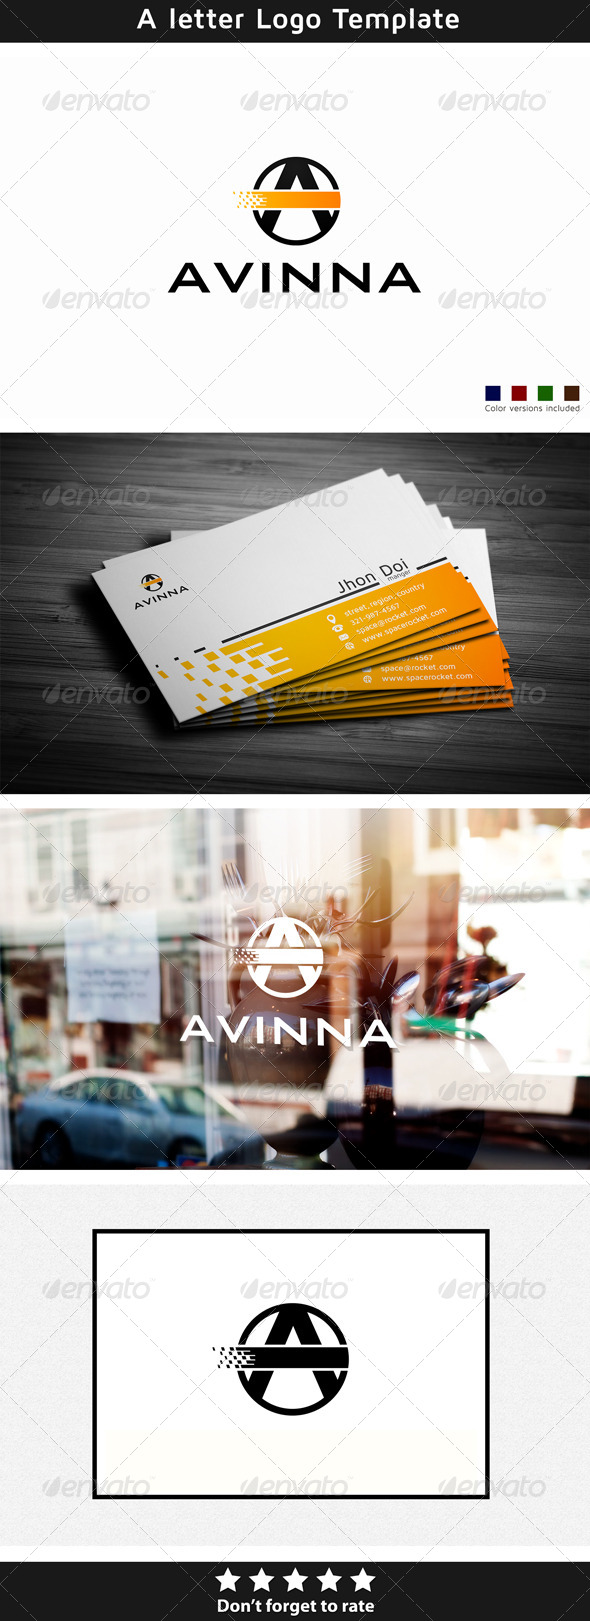 Avinna - Letters Logo Templates